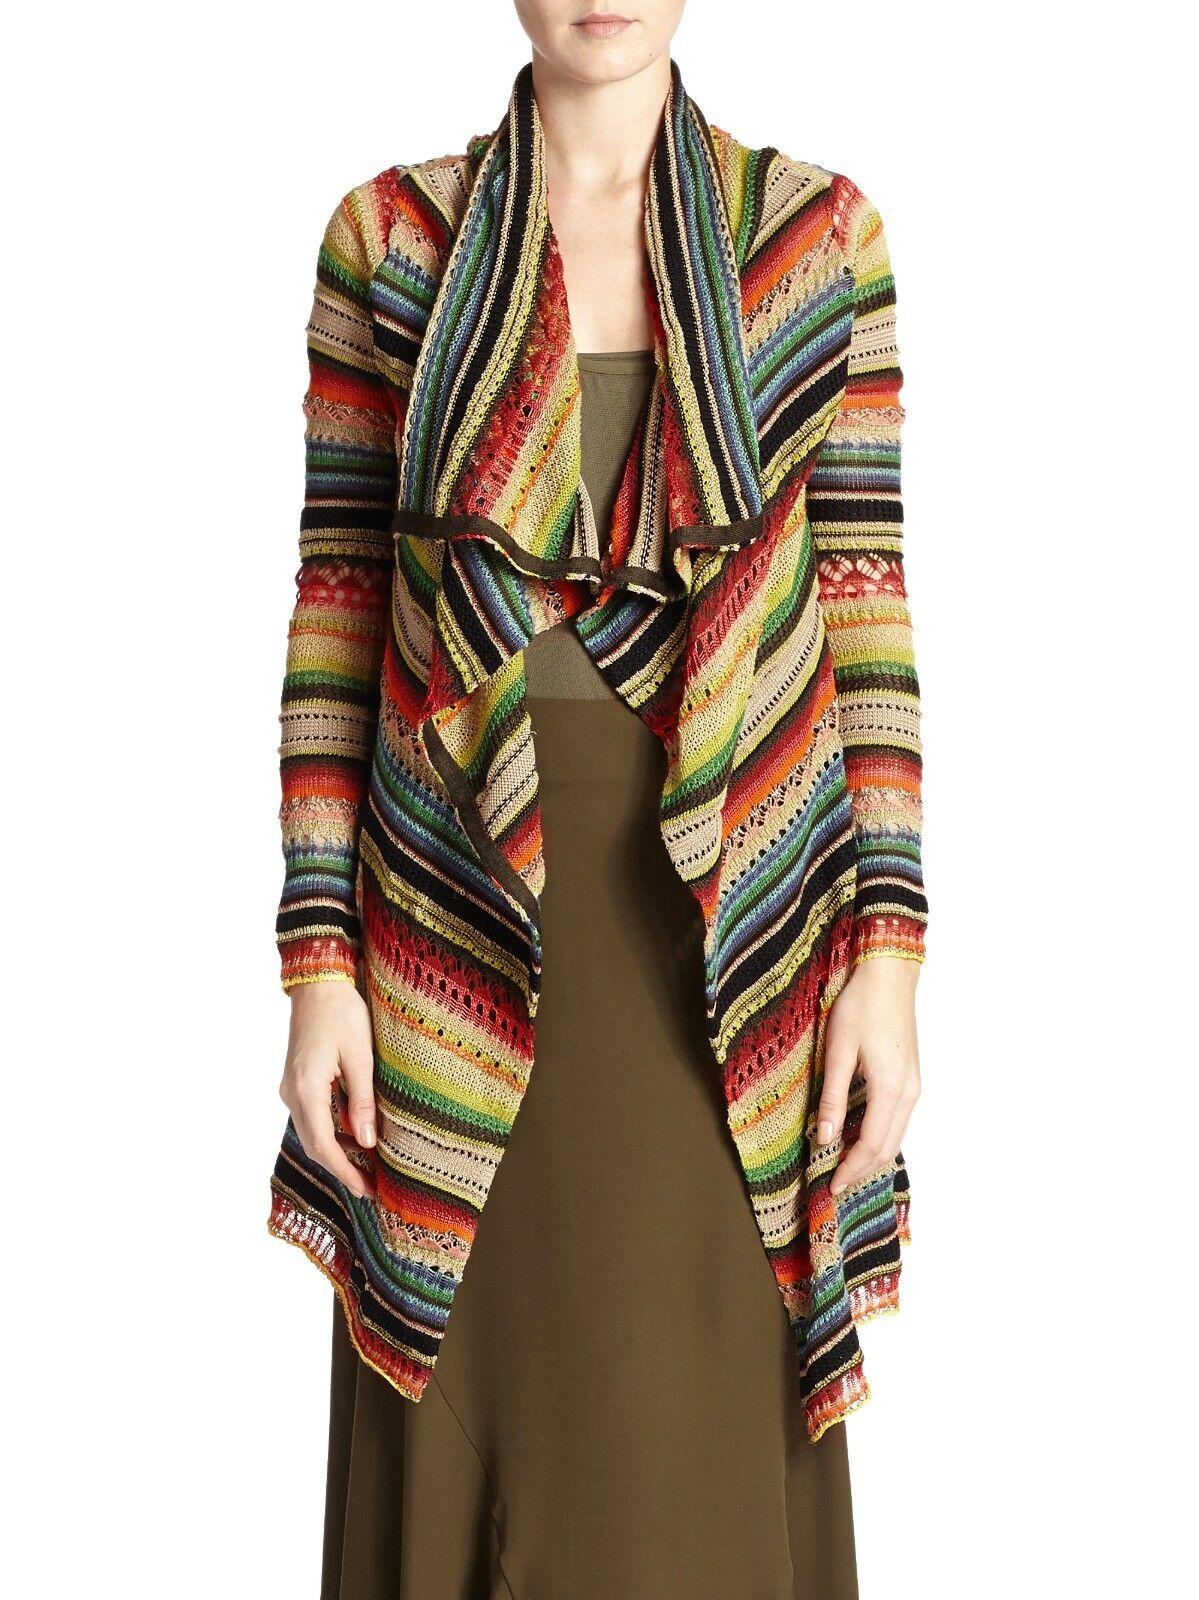 Ralph Lauren Polo Cotton Linen Serape Draped Cardigan Sweater New